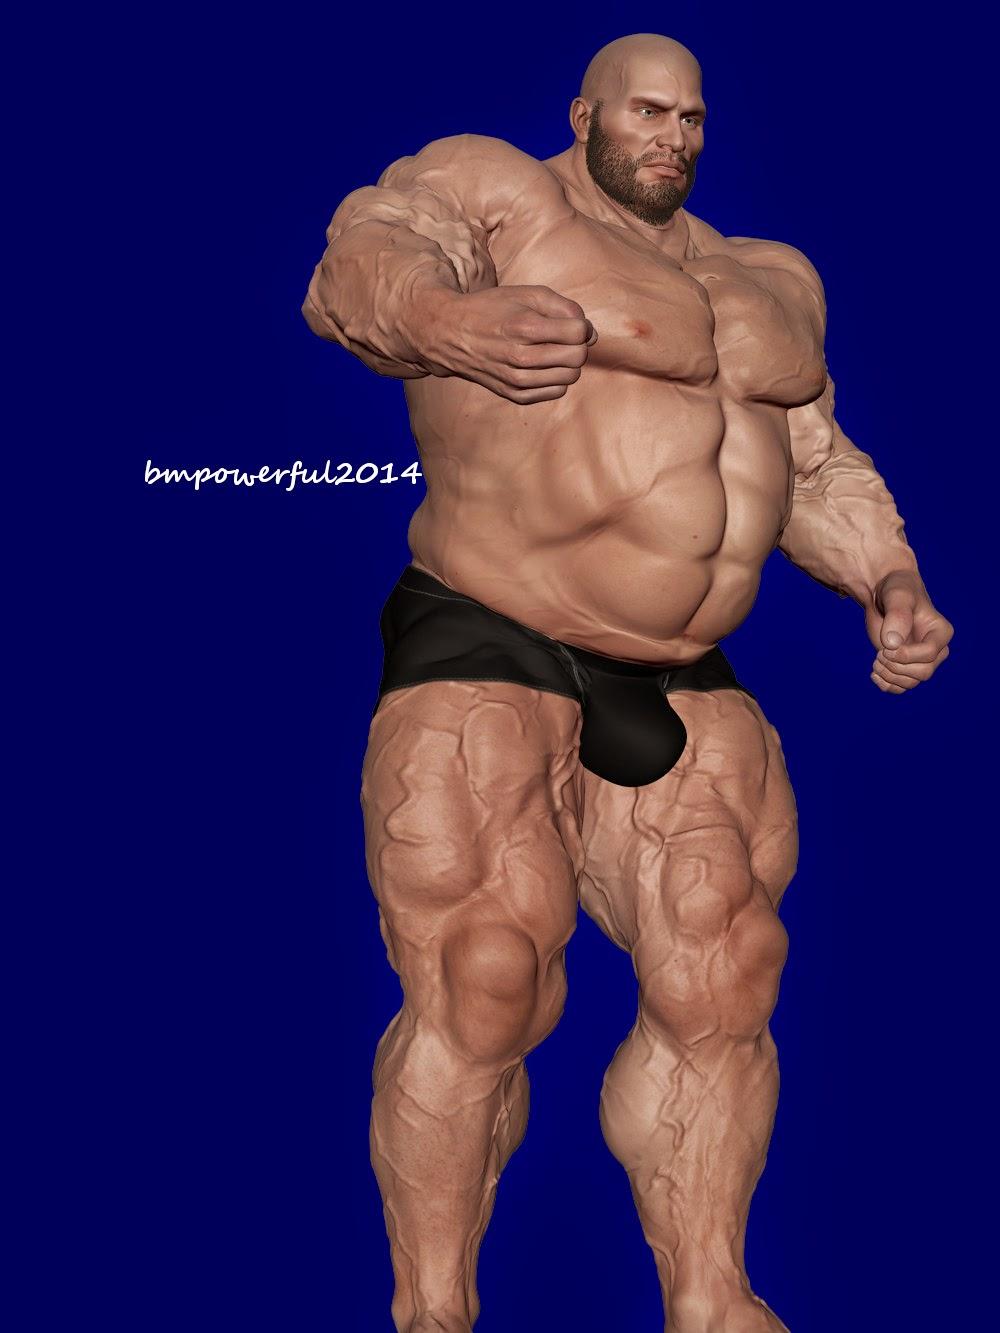 muscular helena may escort